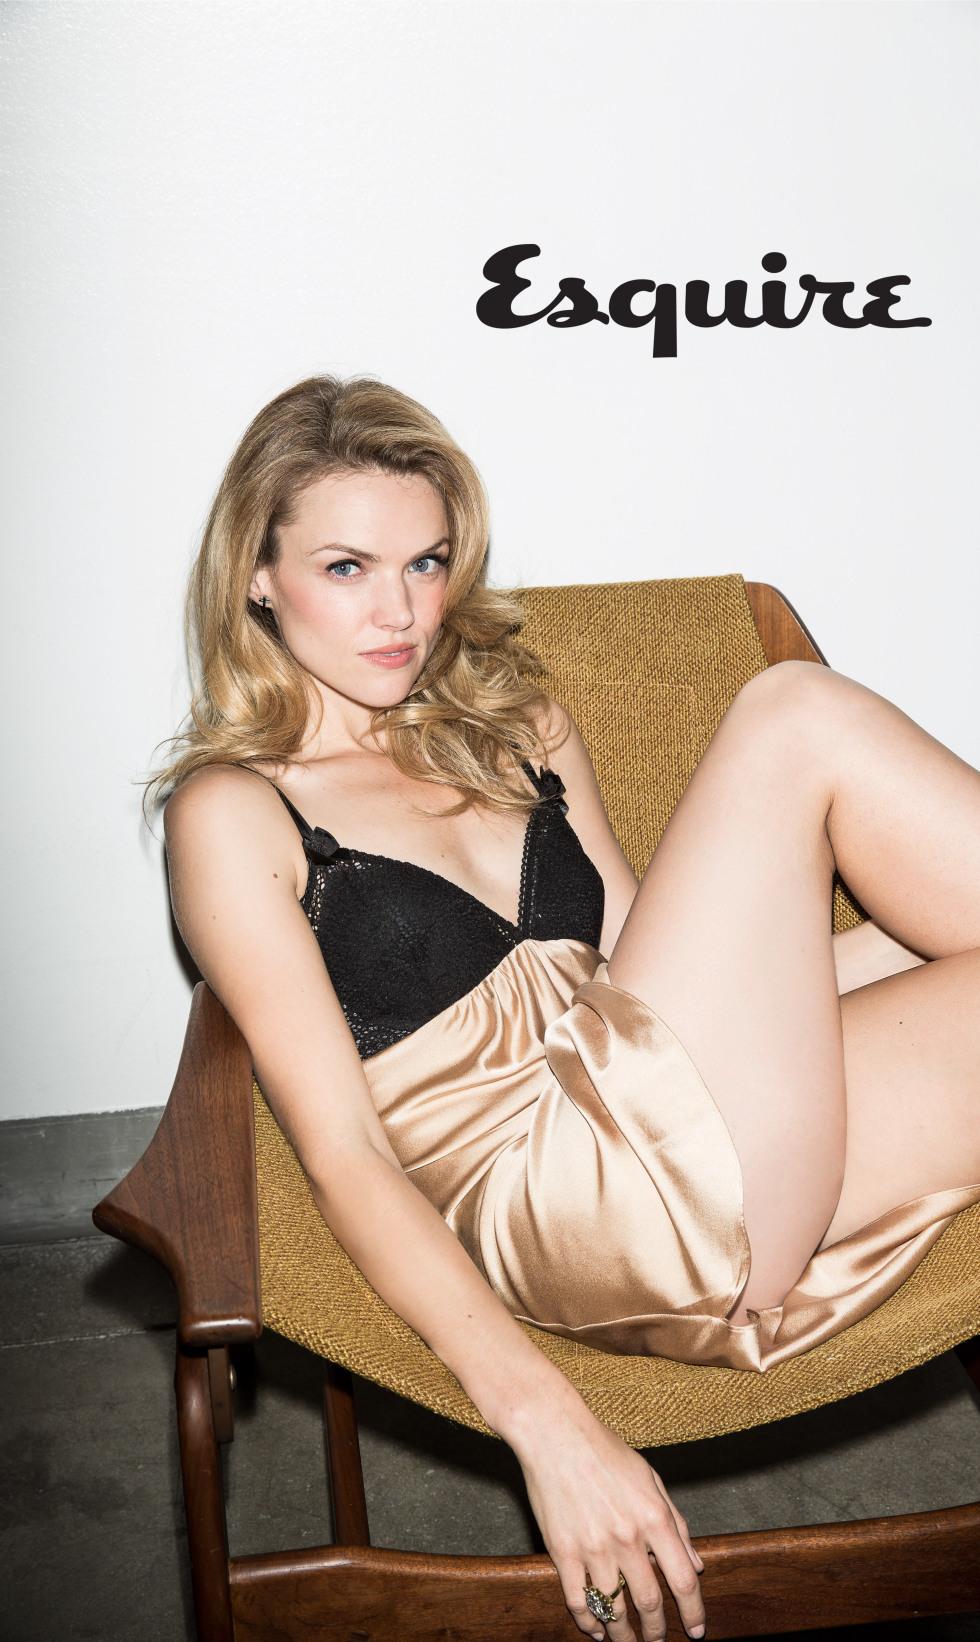 Erin Richards Nude: Gotham City's Sexiest Lady   Article   Break